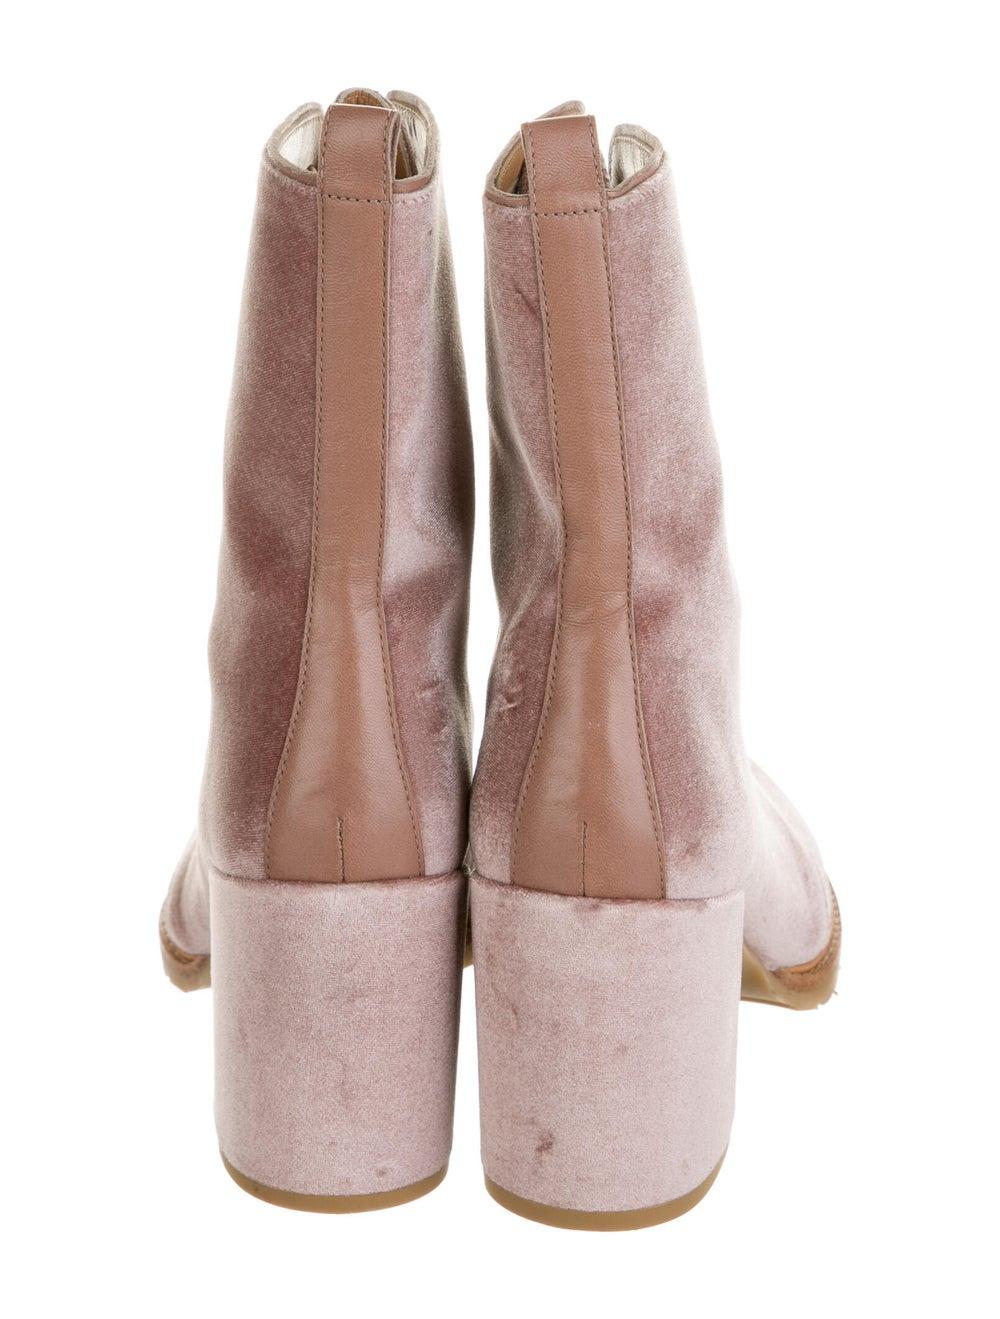 Stuart Weitzman Lace-Up Boots Pink - image 4